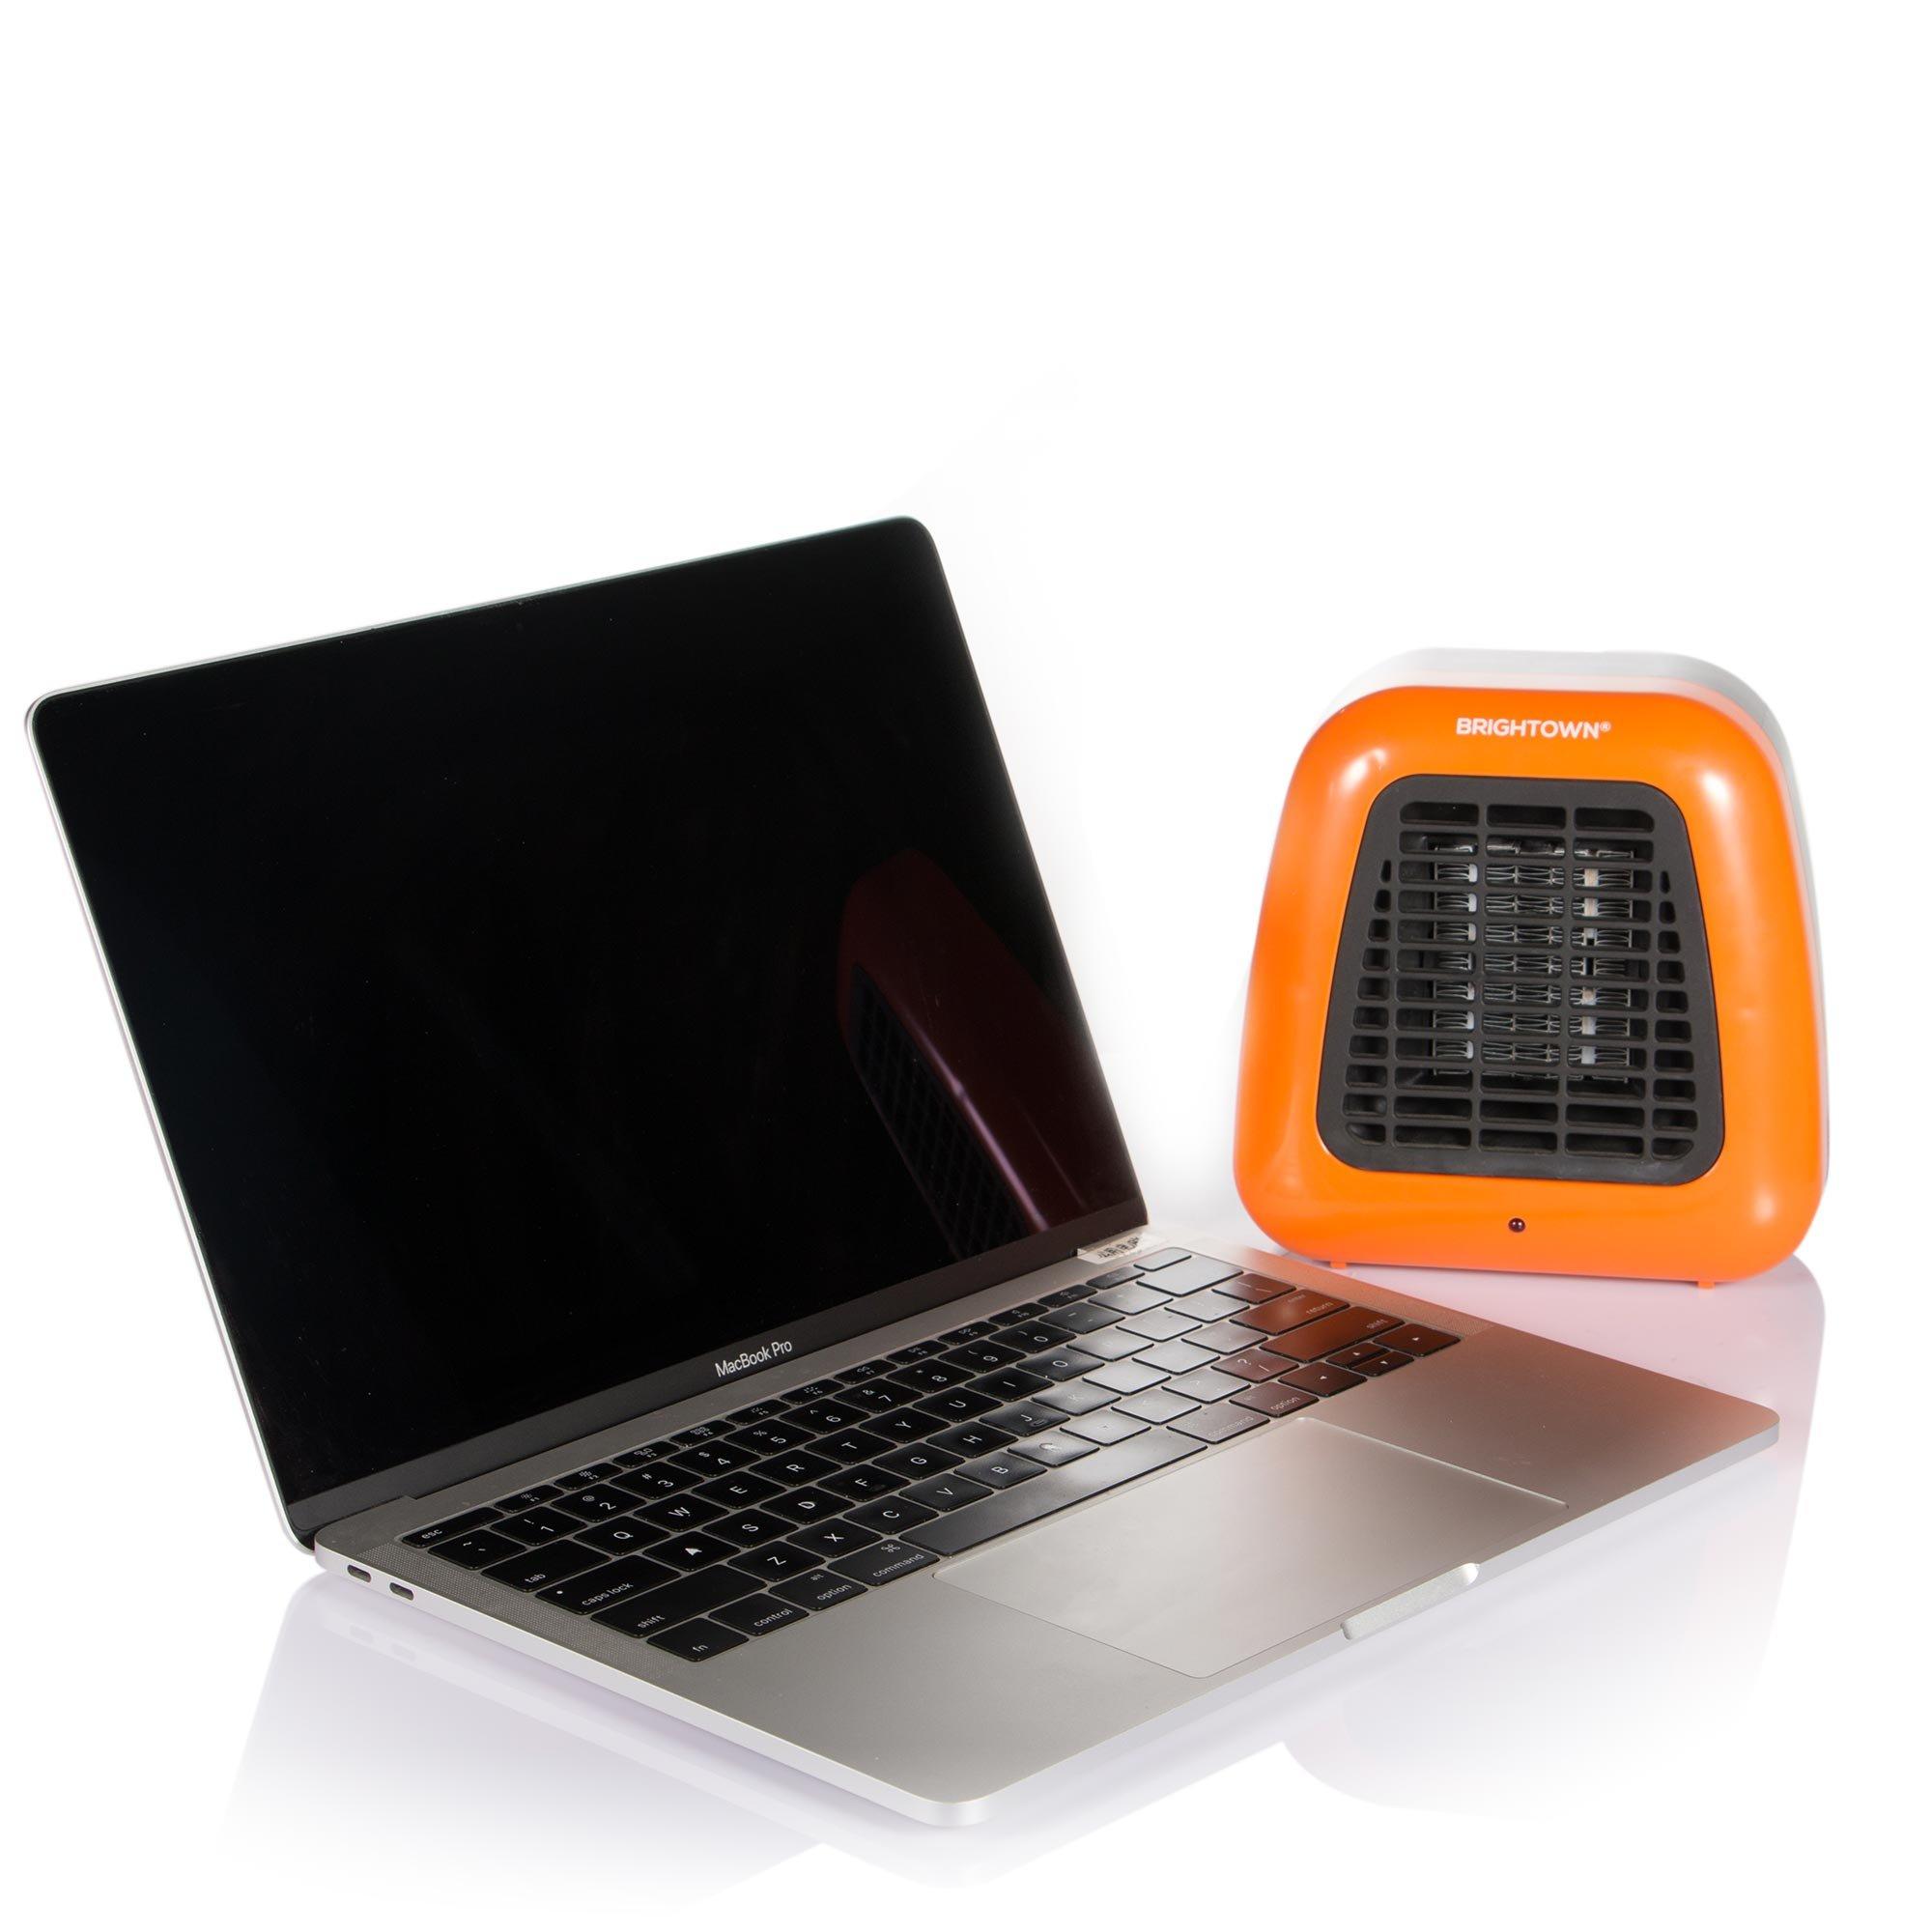 Personal Ceramic Portable-Mini Heater for Office Desktop Table Home Dorm, 400-Watt ETL Listed for Safe Use, Orange by Brightown (Image #6)